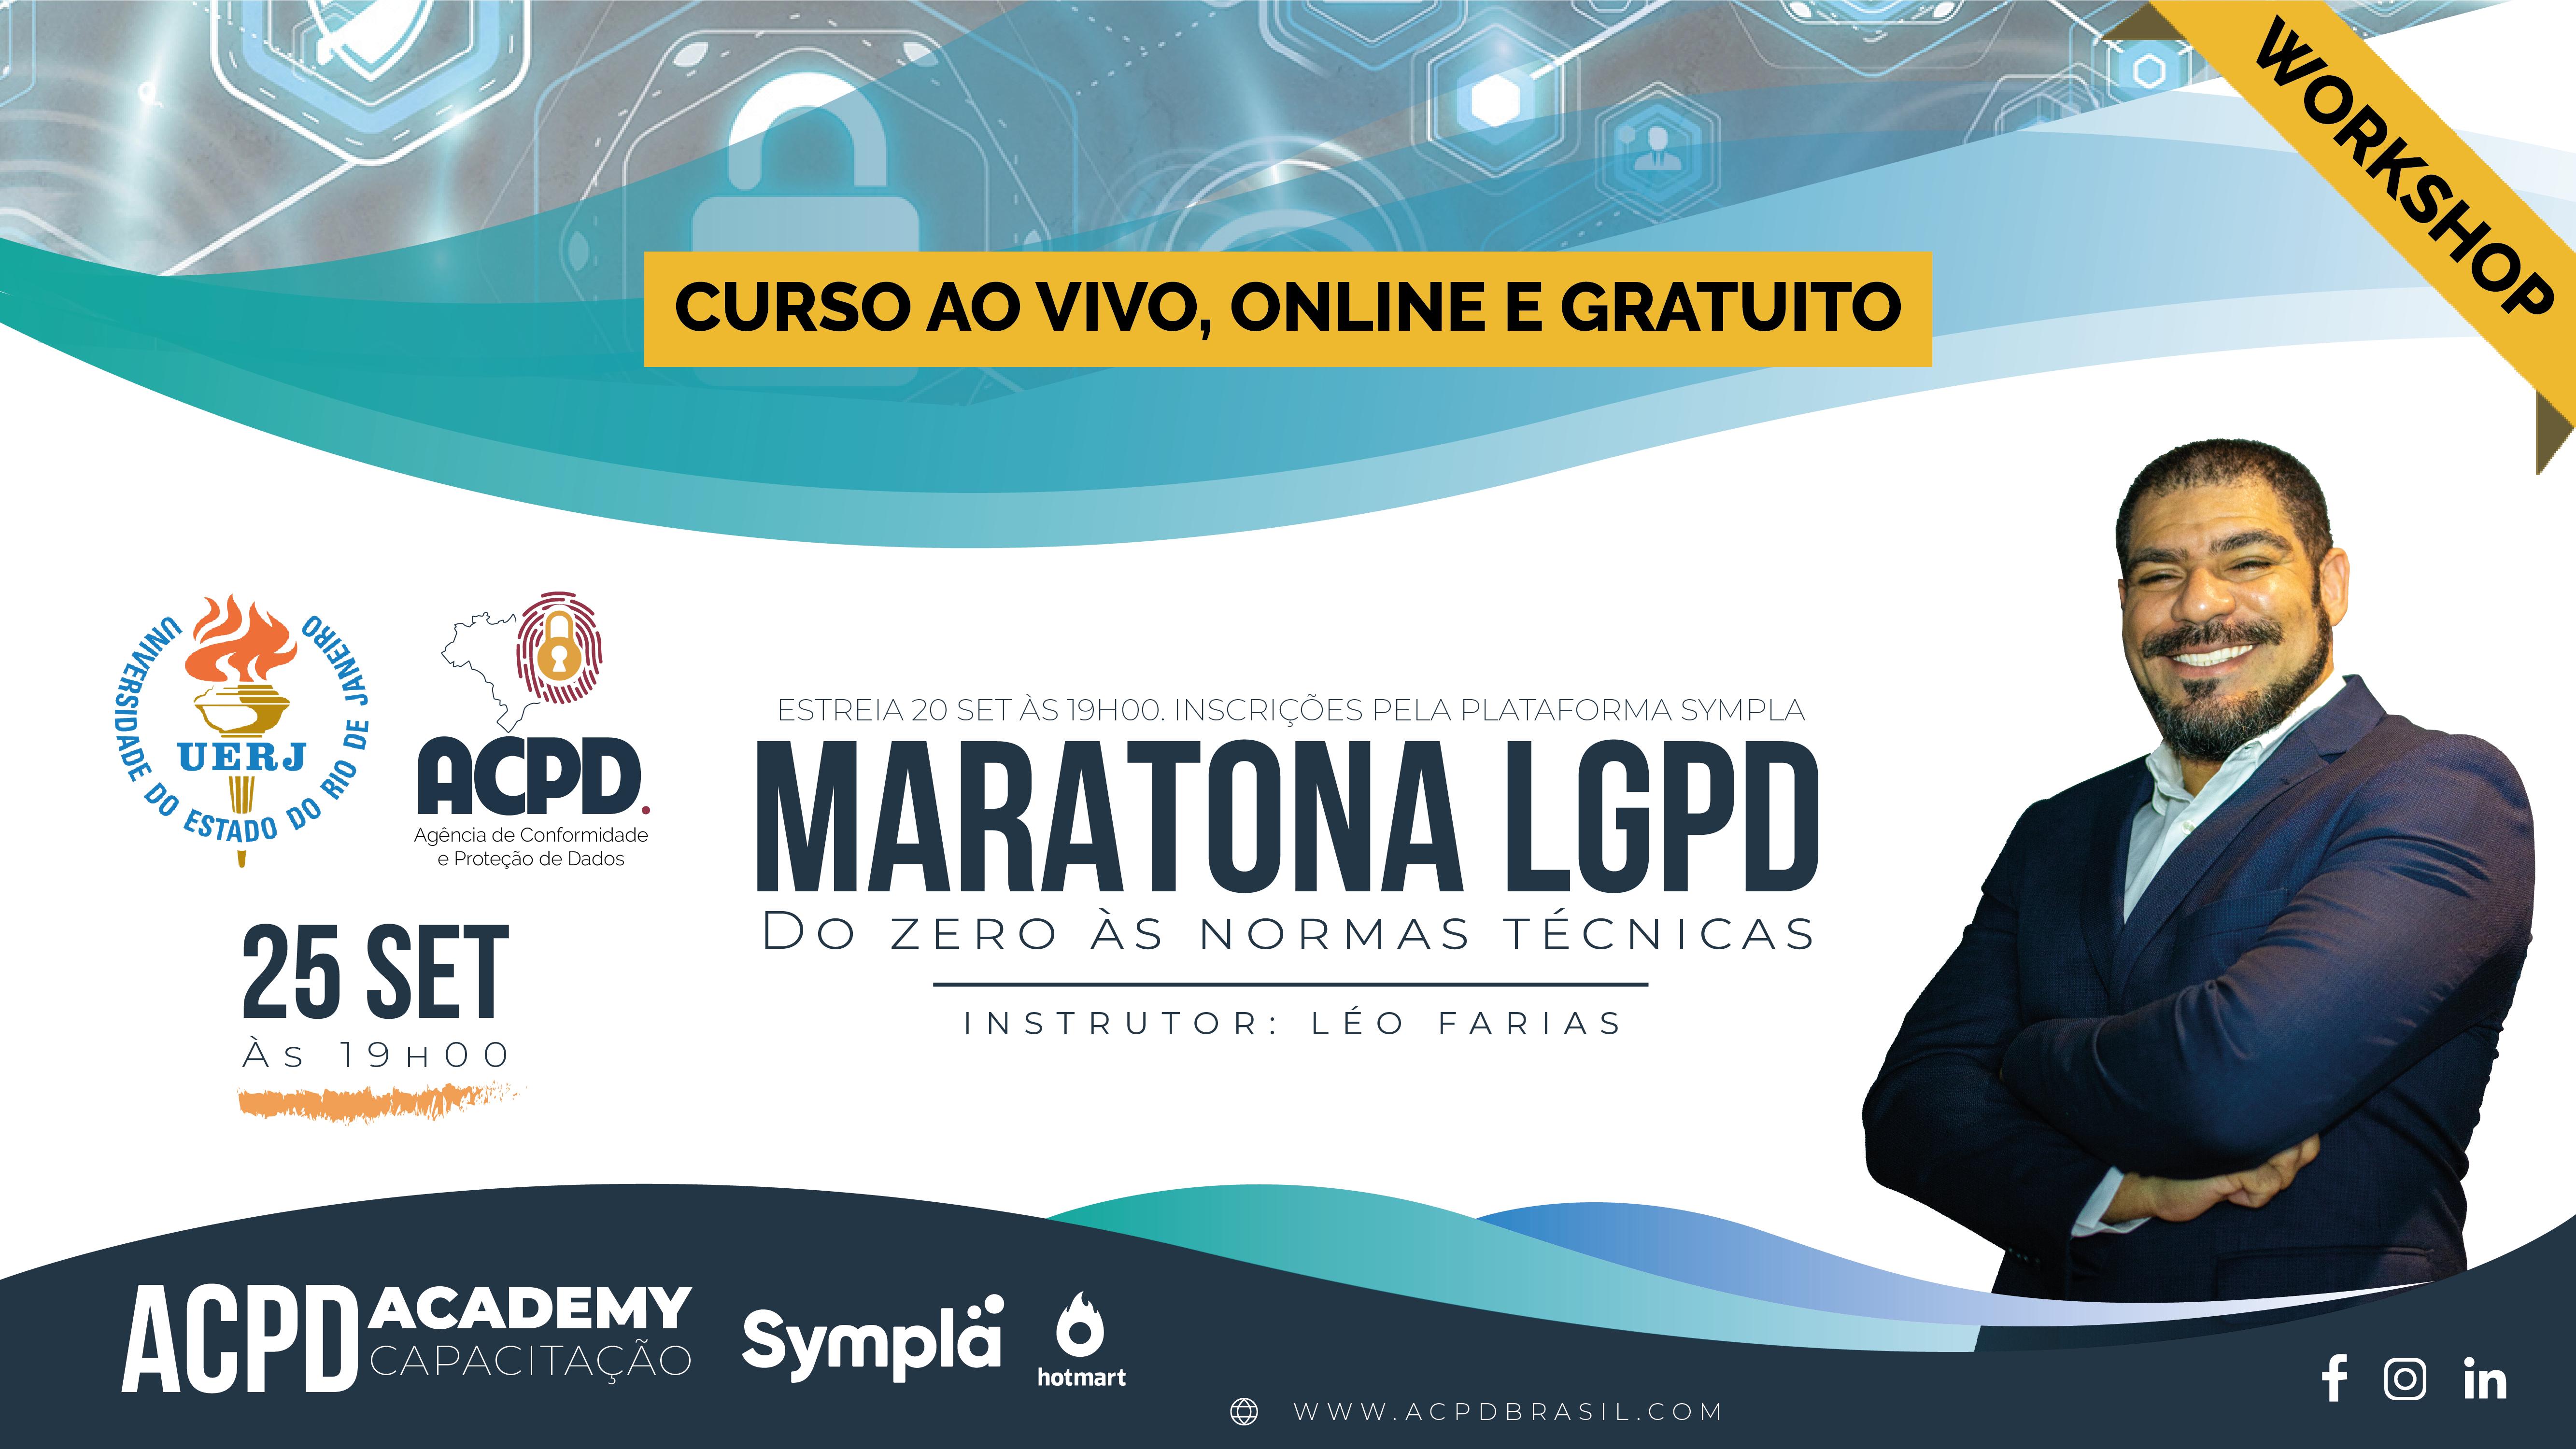 Maratona LGPD: do zero às normas técnicas (T04 – Aula 06: Workshop)